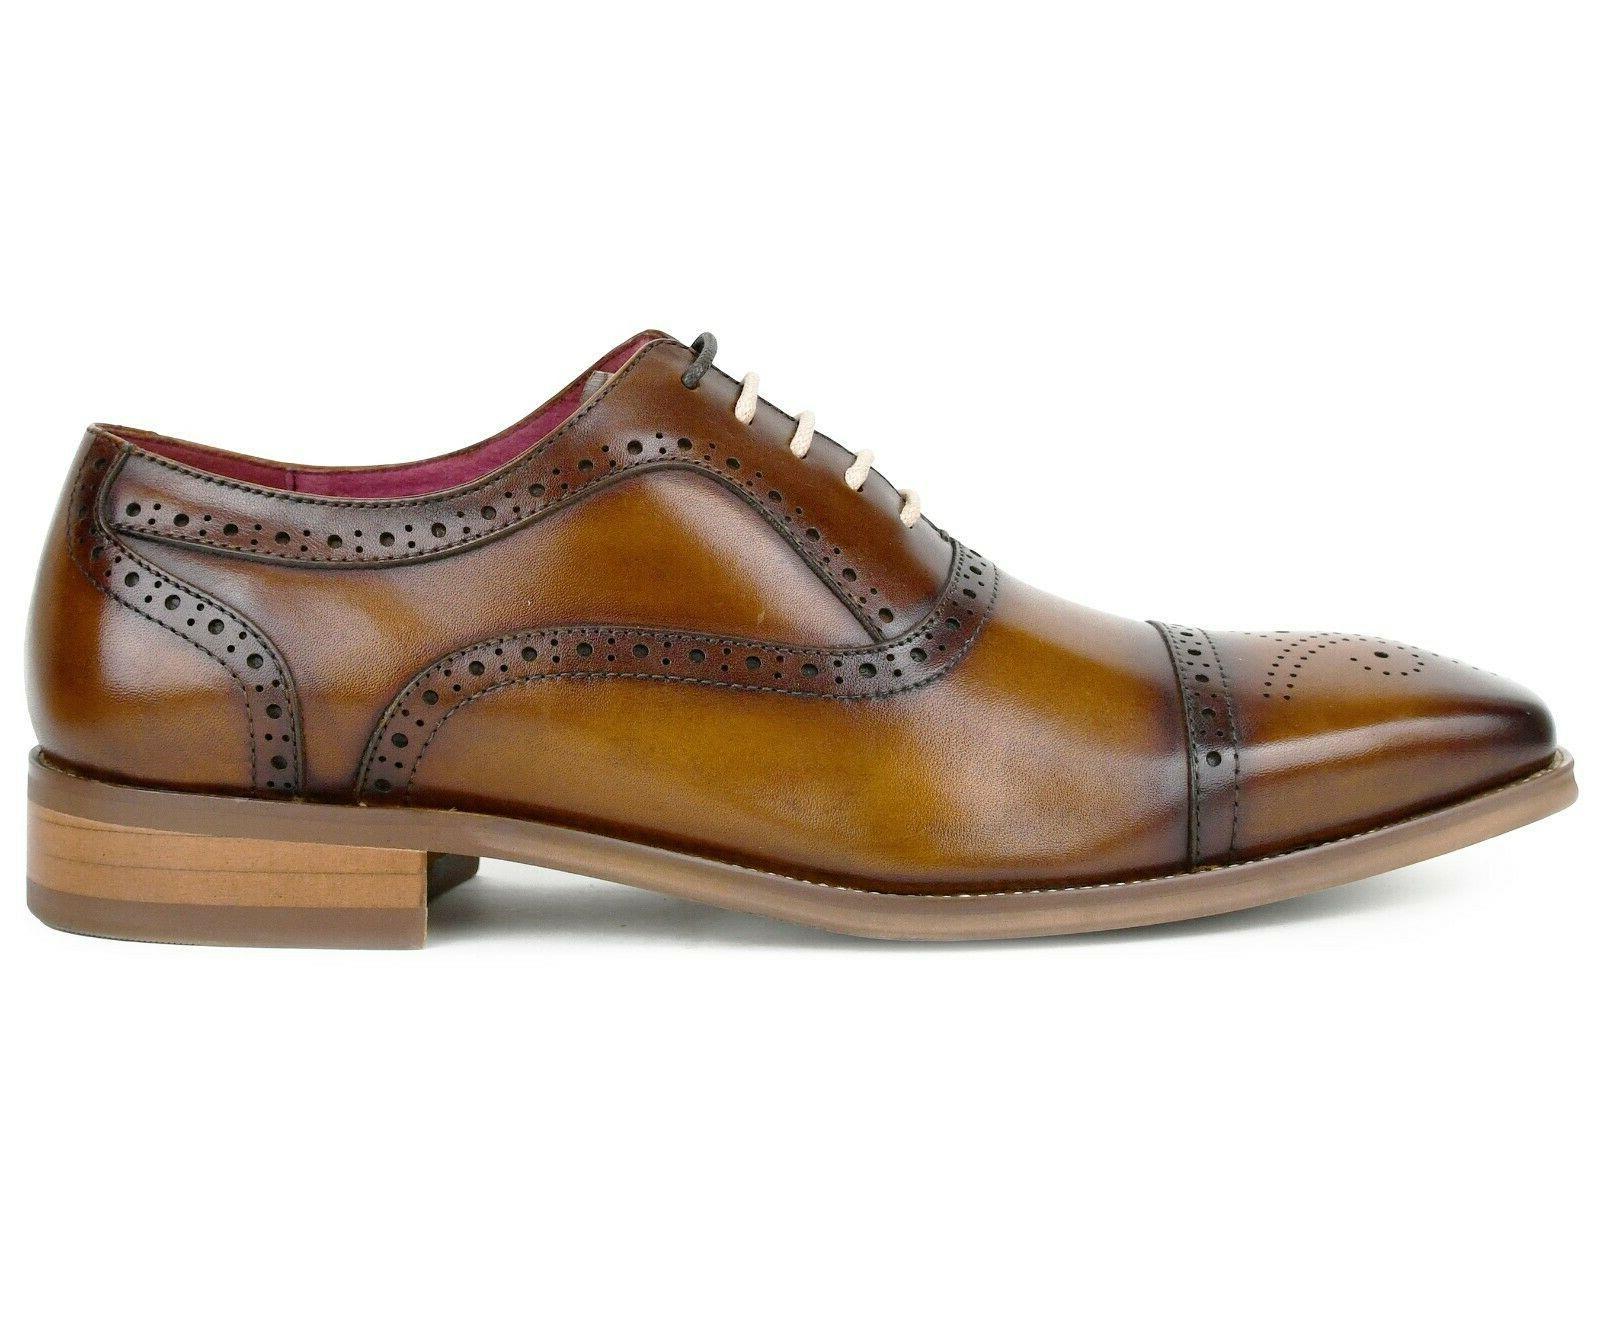 Men's Dress Shoes Genuine Leather Oxfords, Lace Up Dress